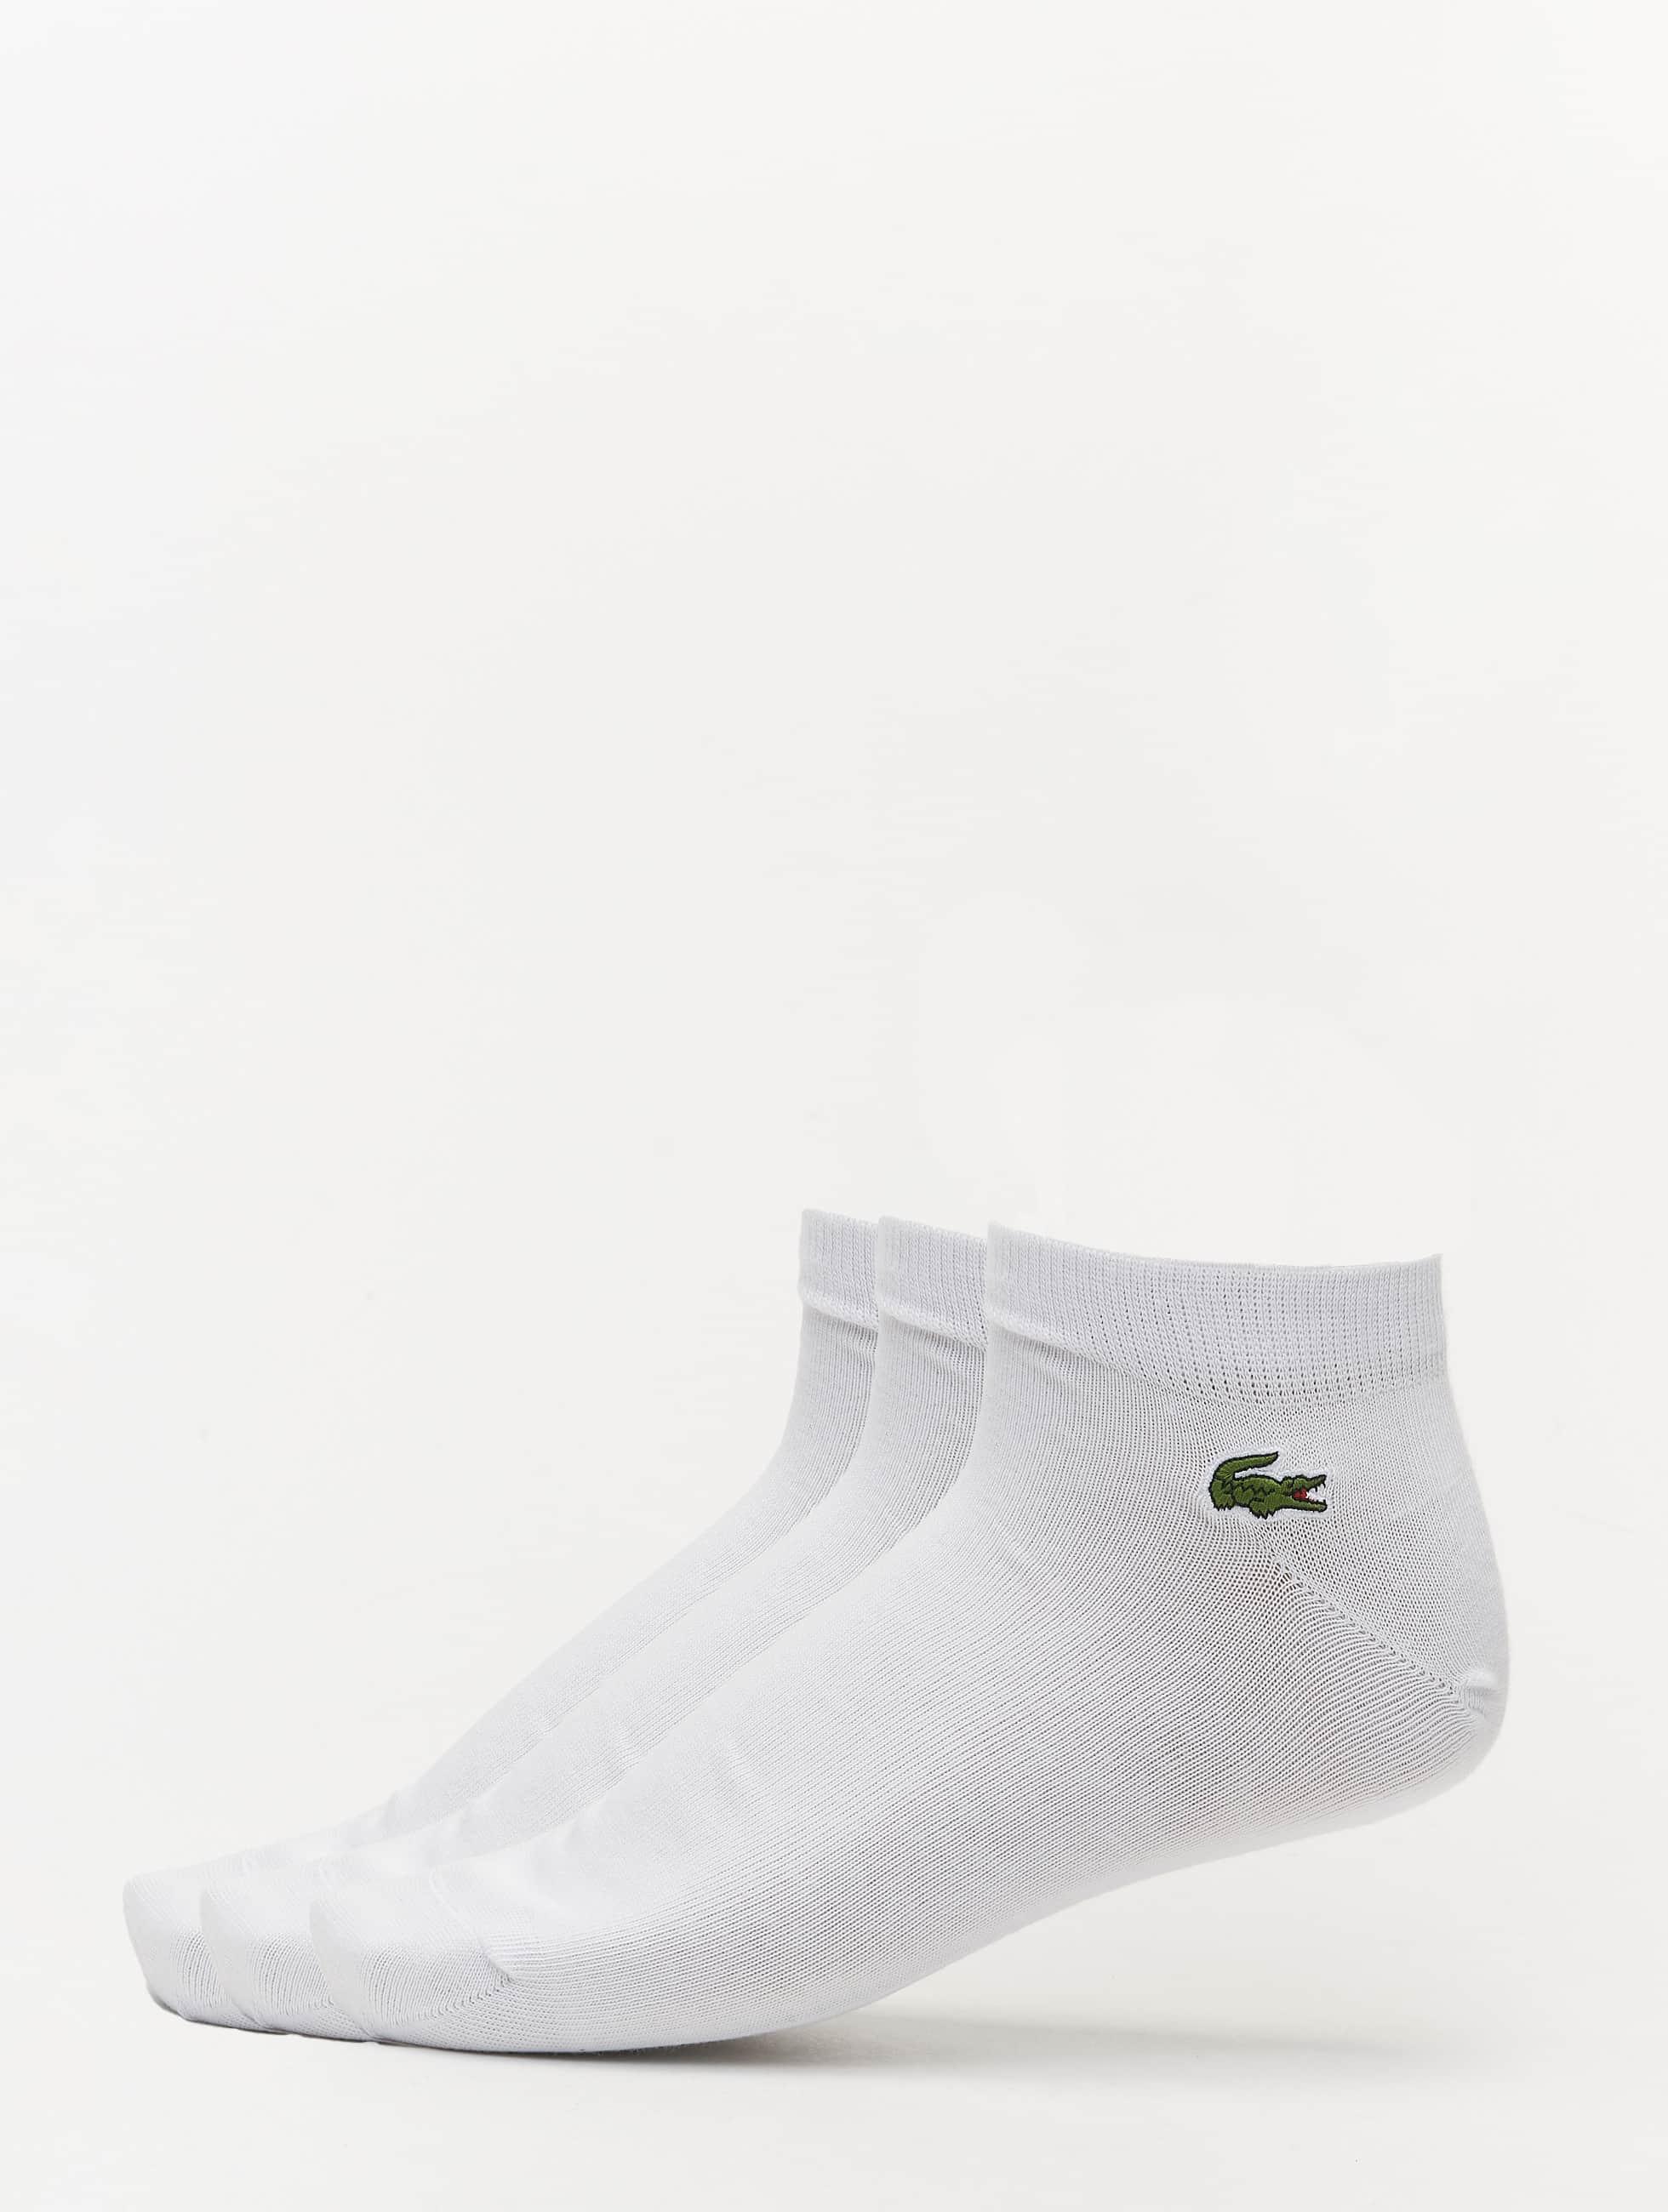 Lacoste Classic Socken 3er-Pack weiß